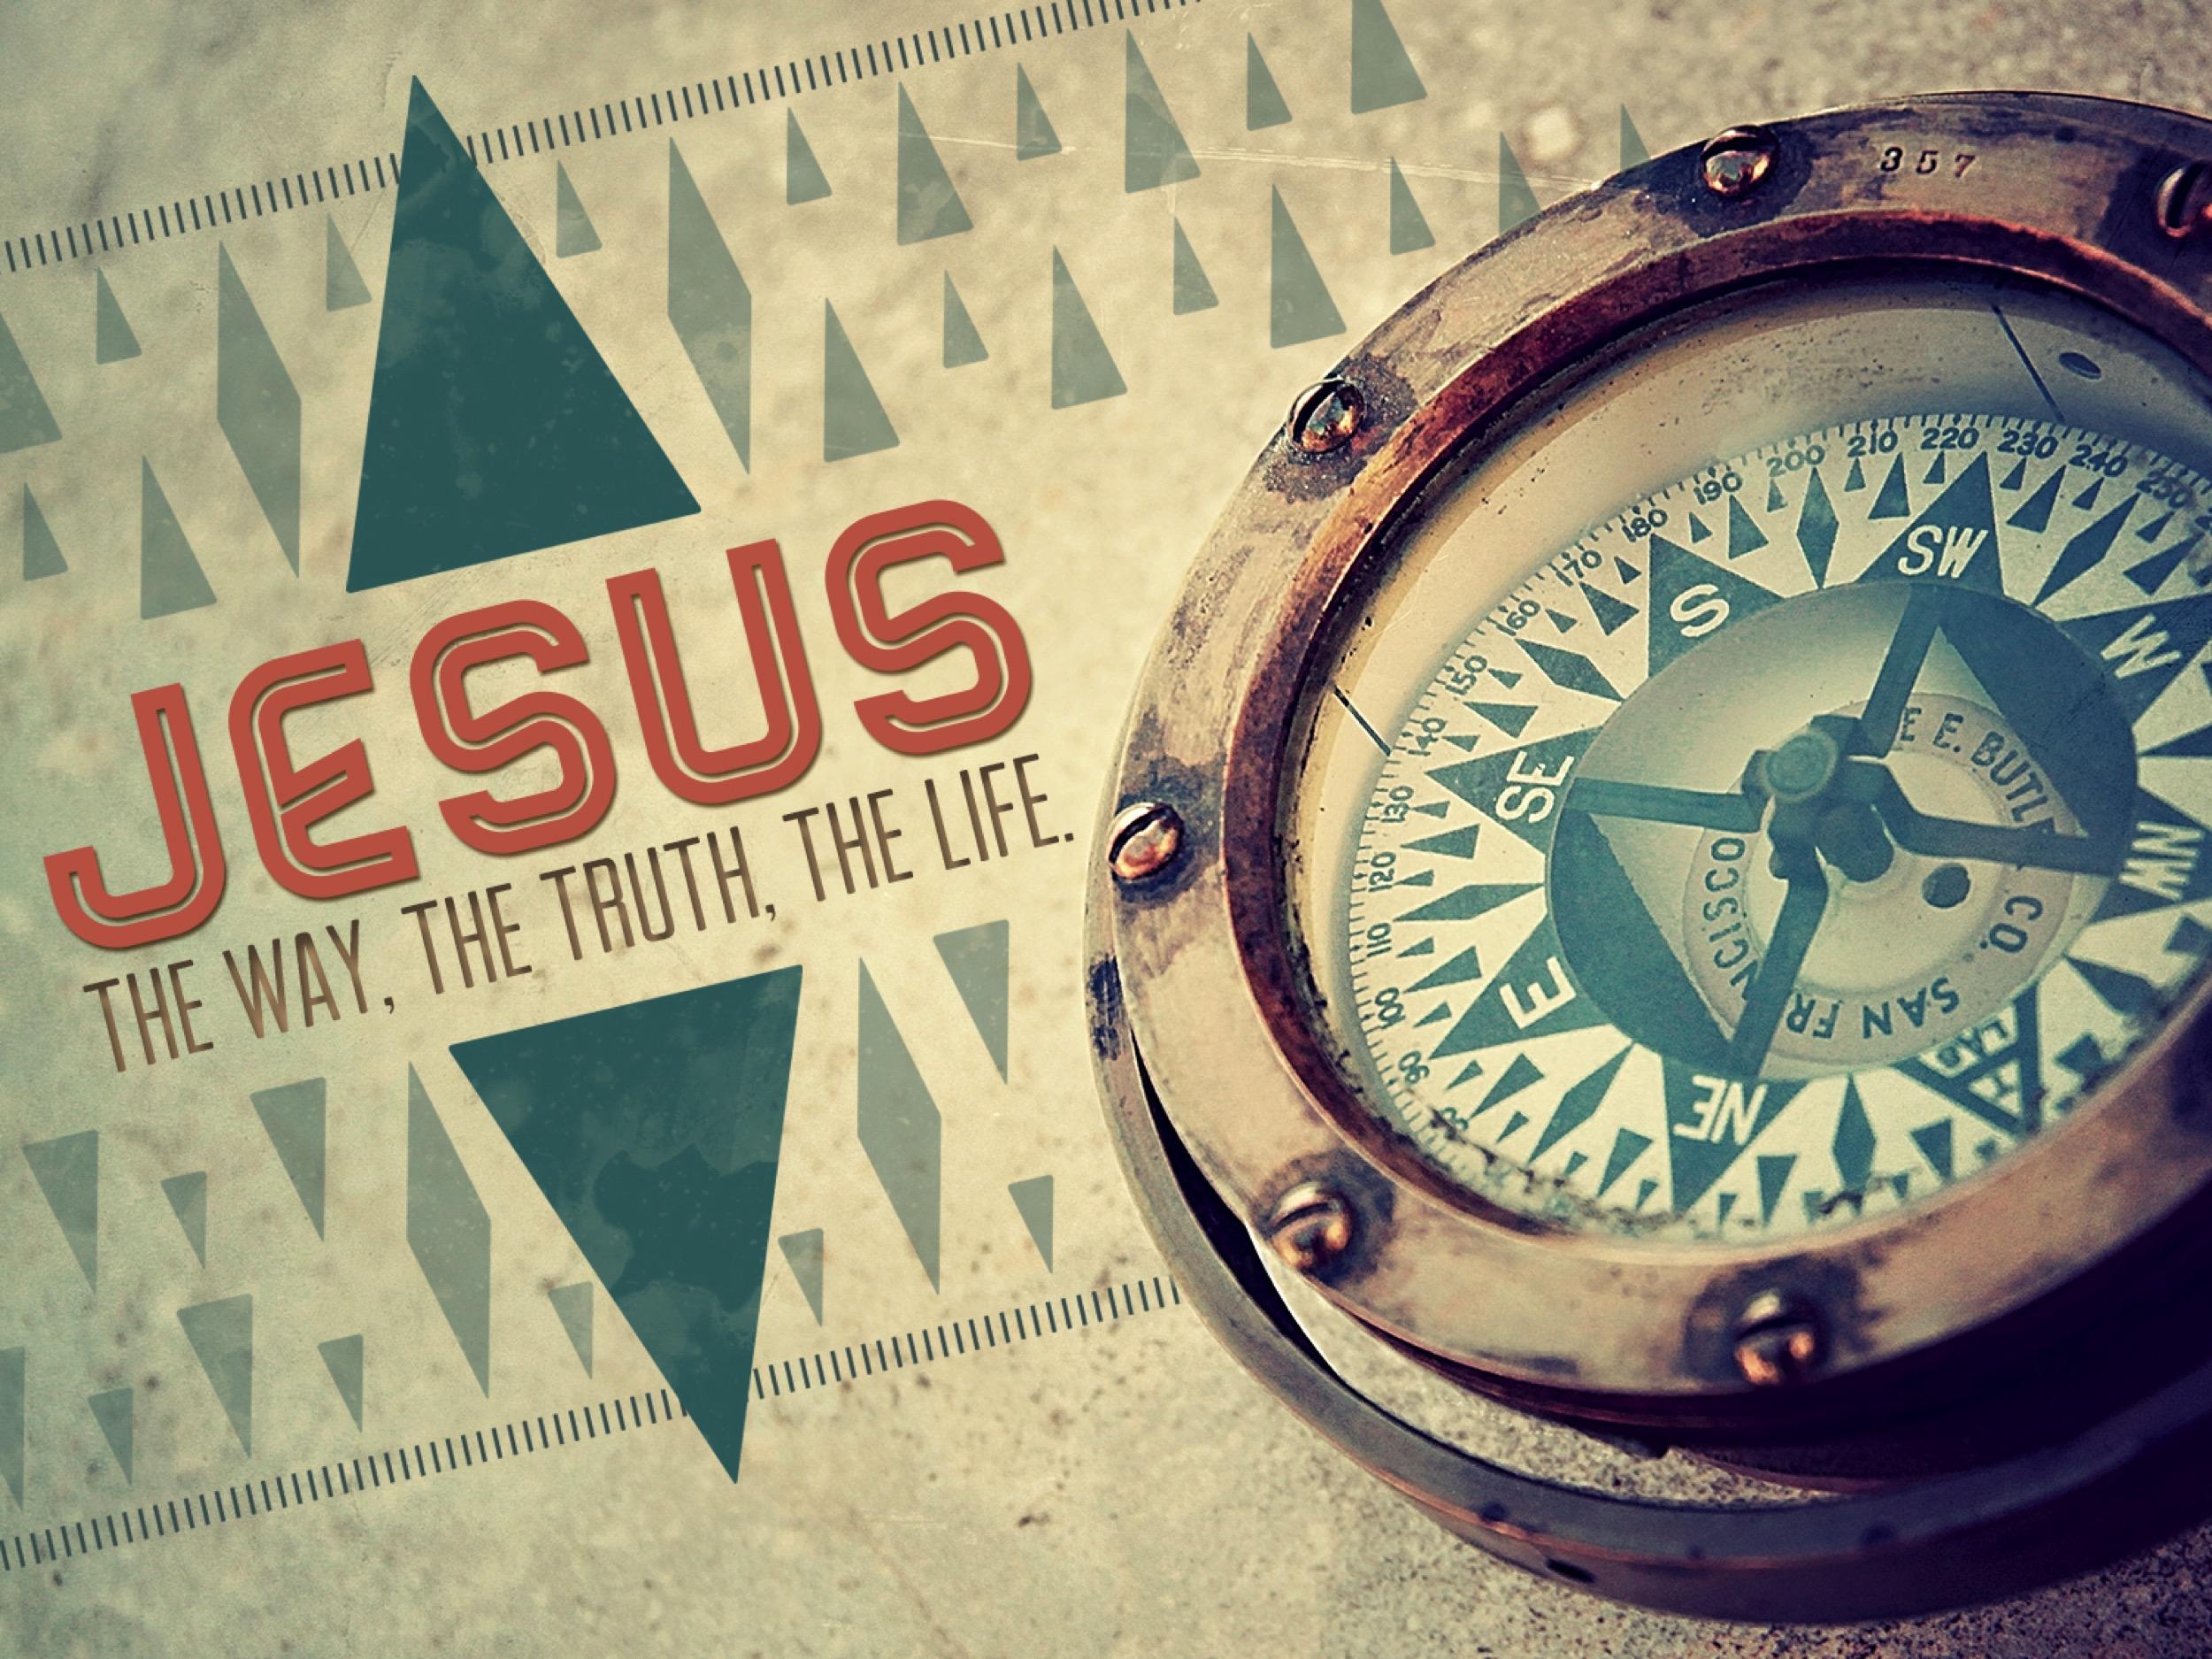 The Life Of Jesus P42